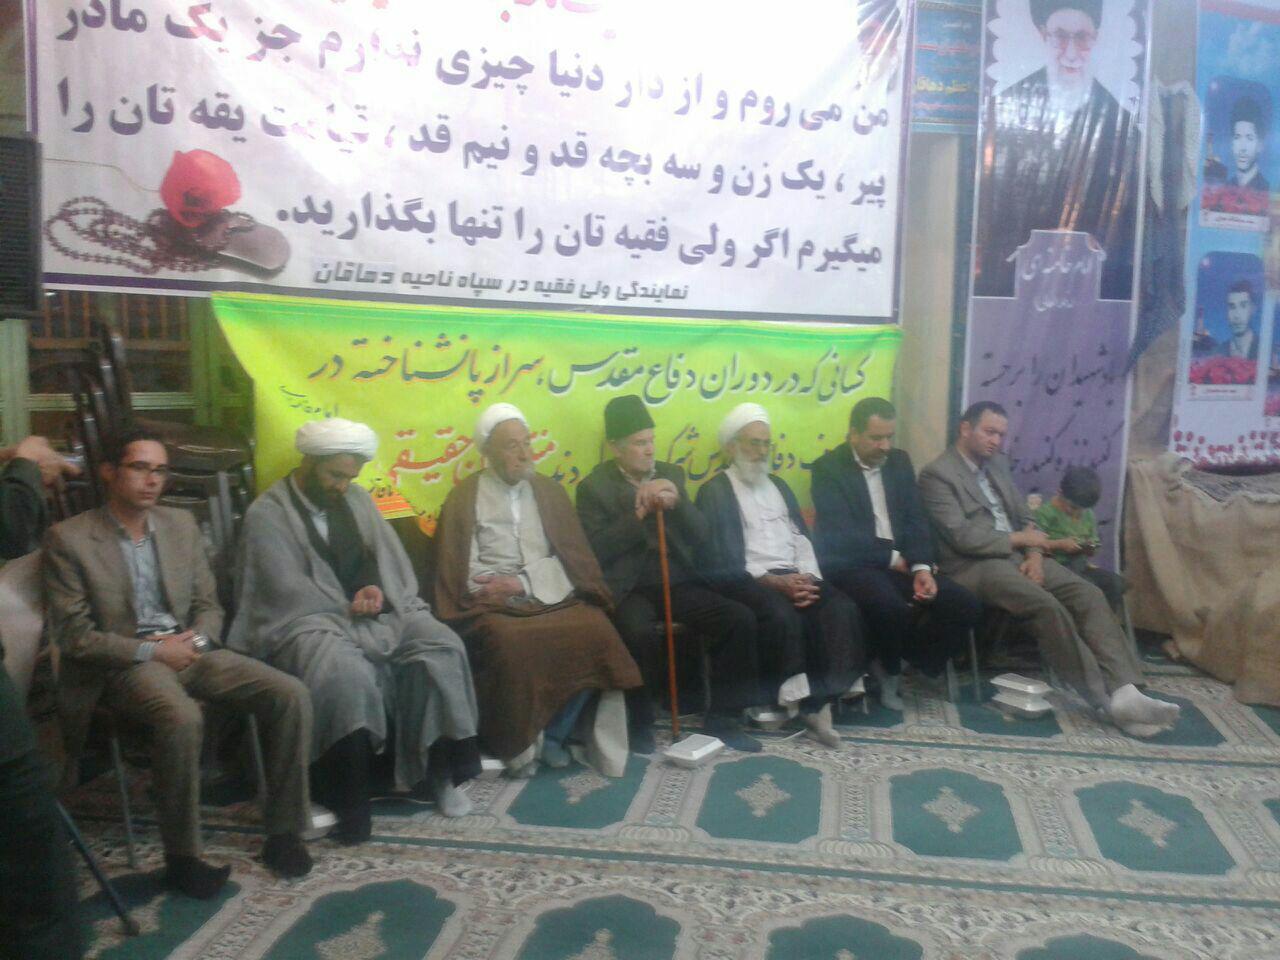 حضورحجت الاسلام والمسلمین حاج آقااژدری مدیرکل محترم موقوفات واملاک در دهاقان